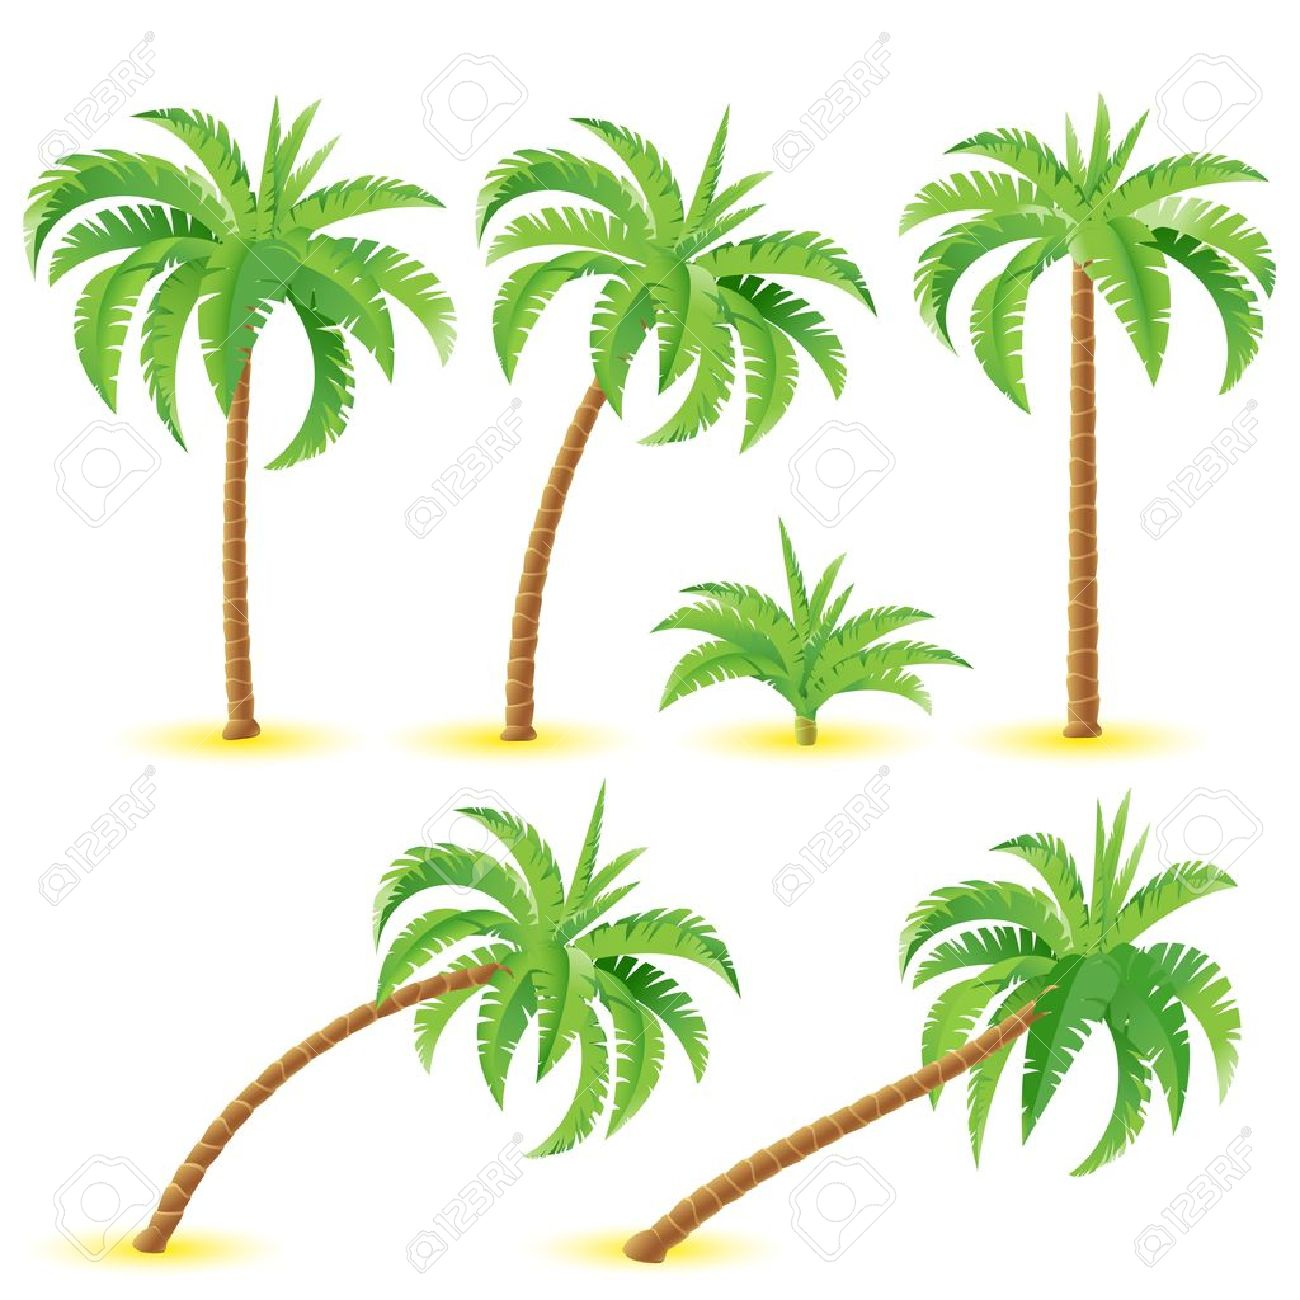 Coconut palms. Illustration on white background for design Stock Vector - 13109324